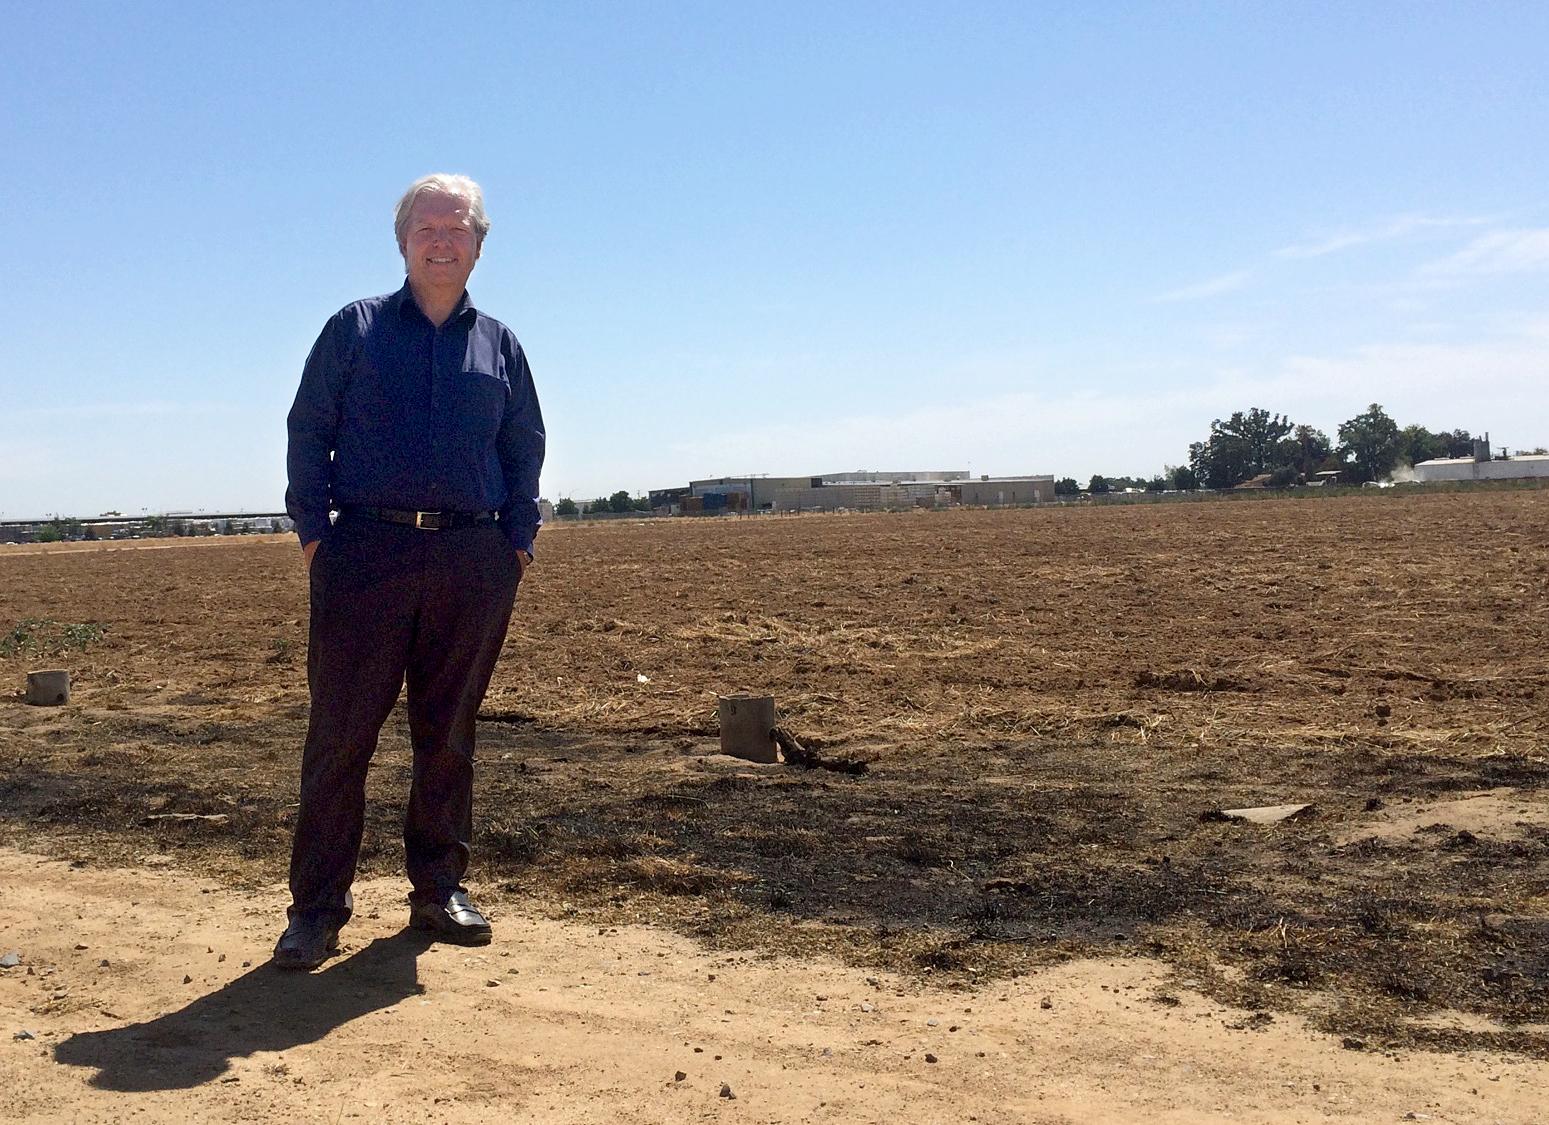 California's Drought Spurs Unexpected Effect: Eco-Friendly Development